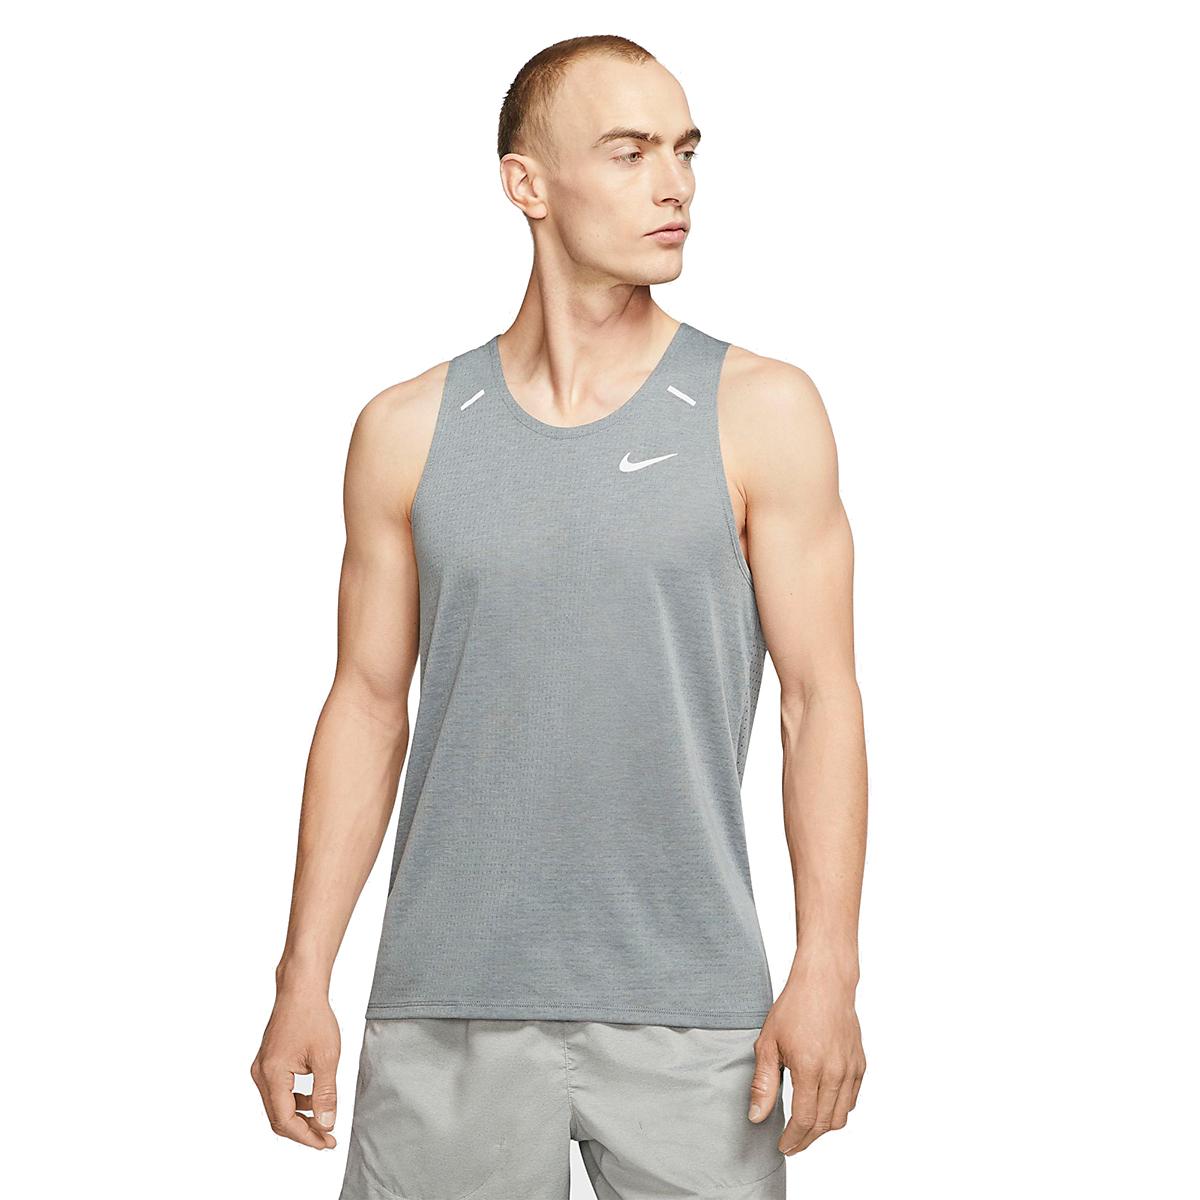 Men's Nike Rise 365 Running Tank - Color: Smoke Grey/Heather - Size: S, Smoke Grey/Heather, large, image 1